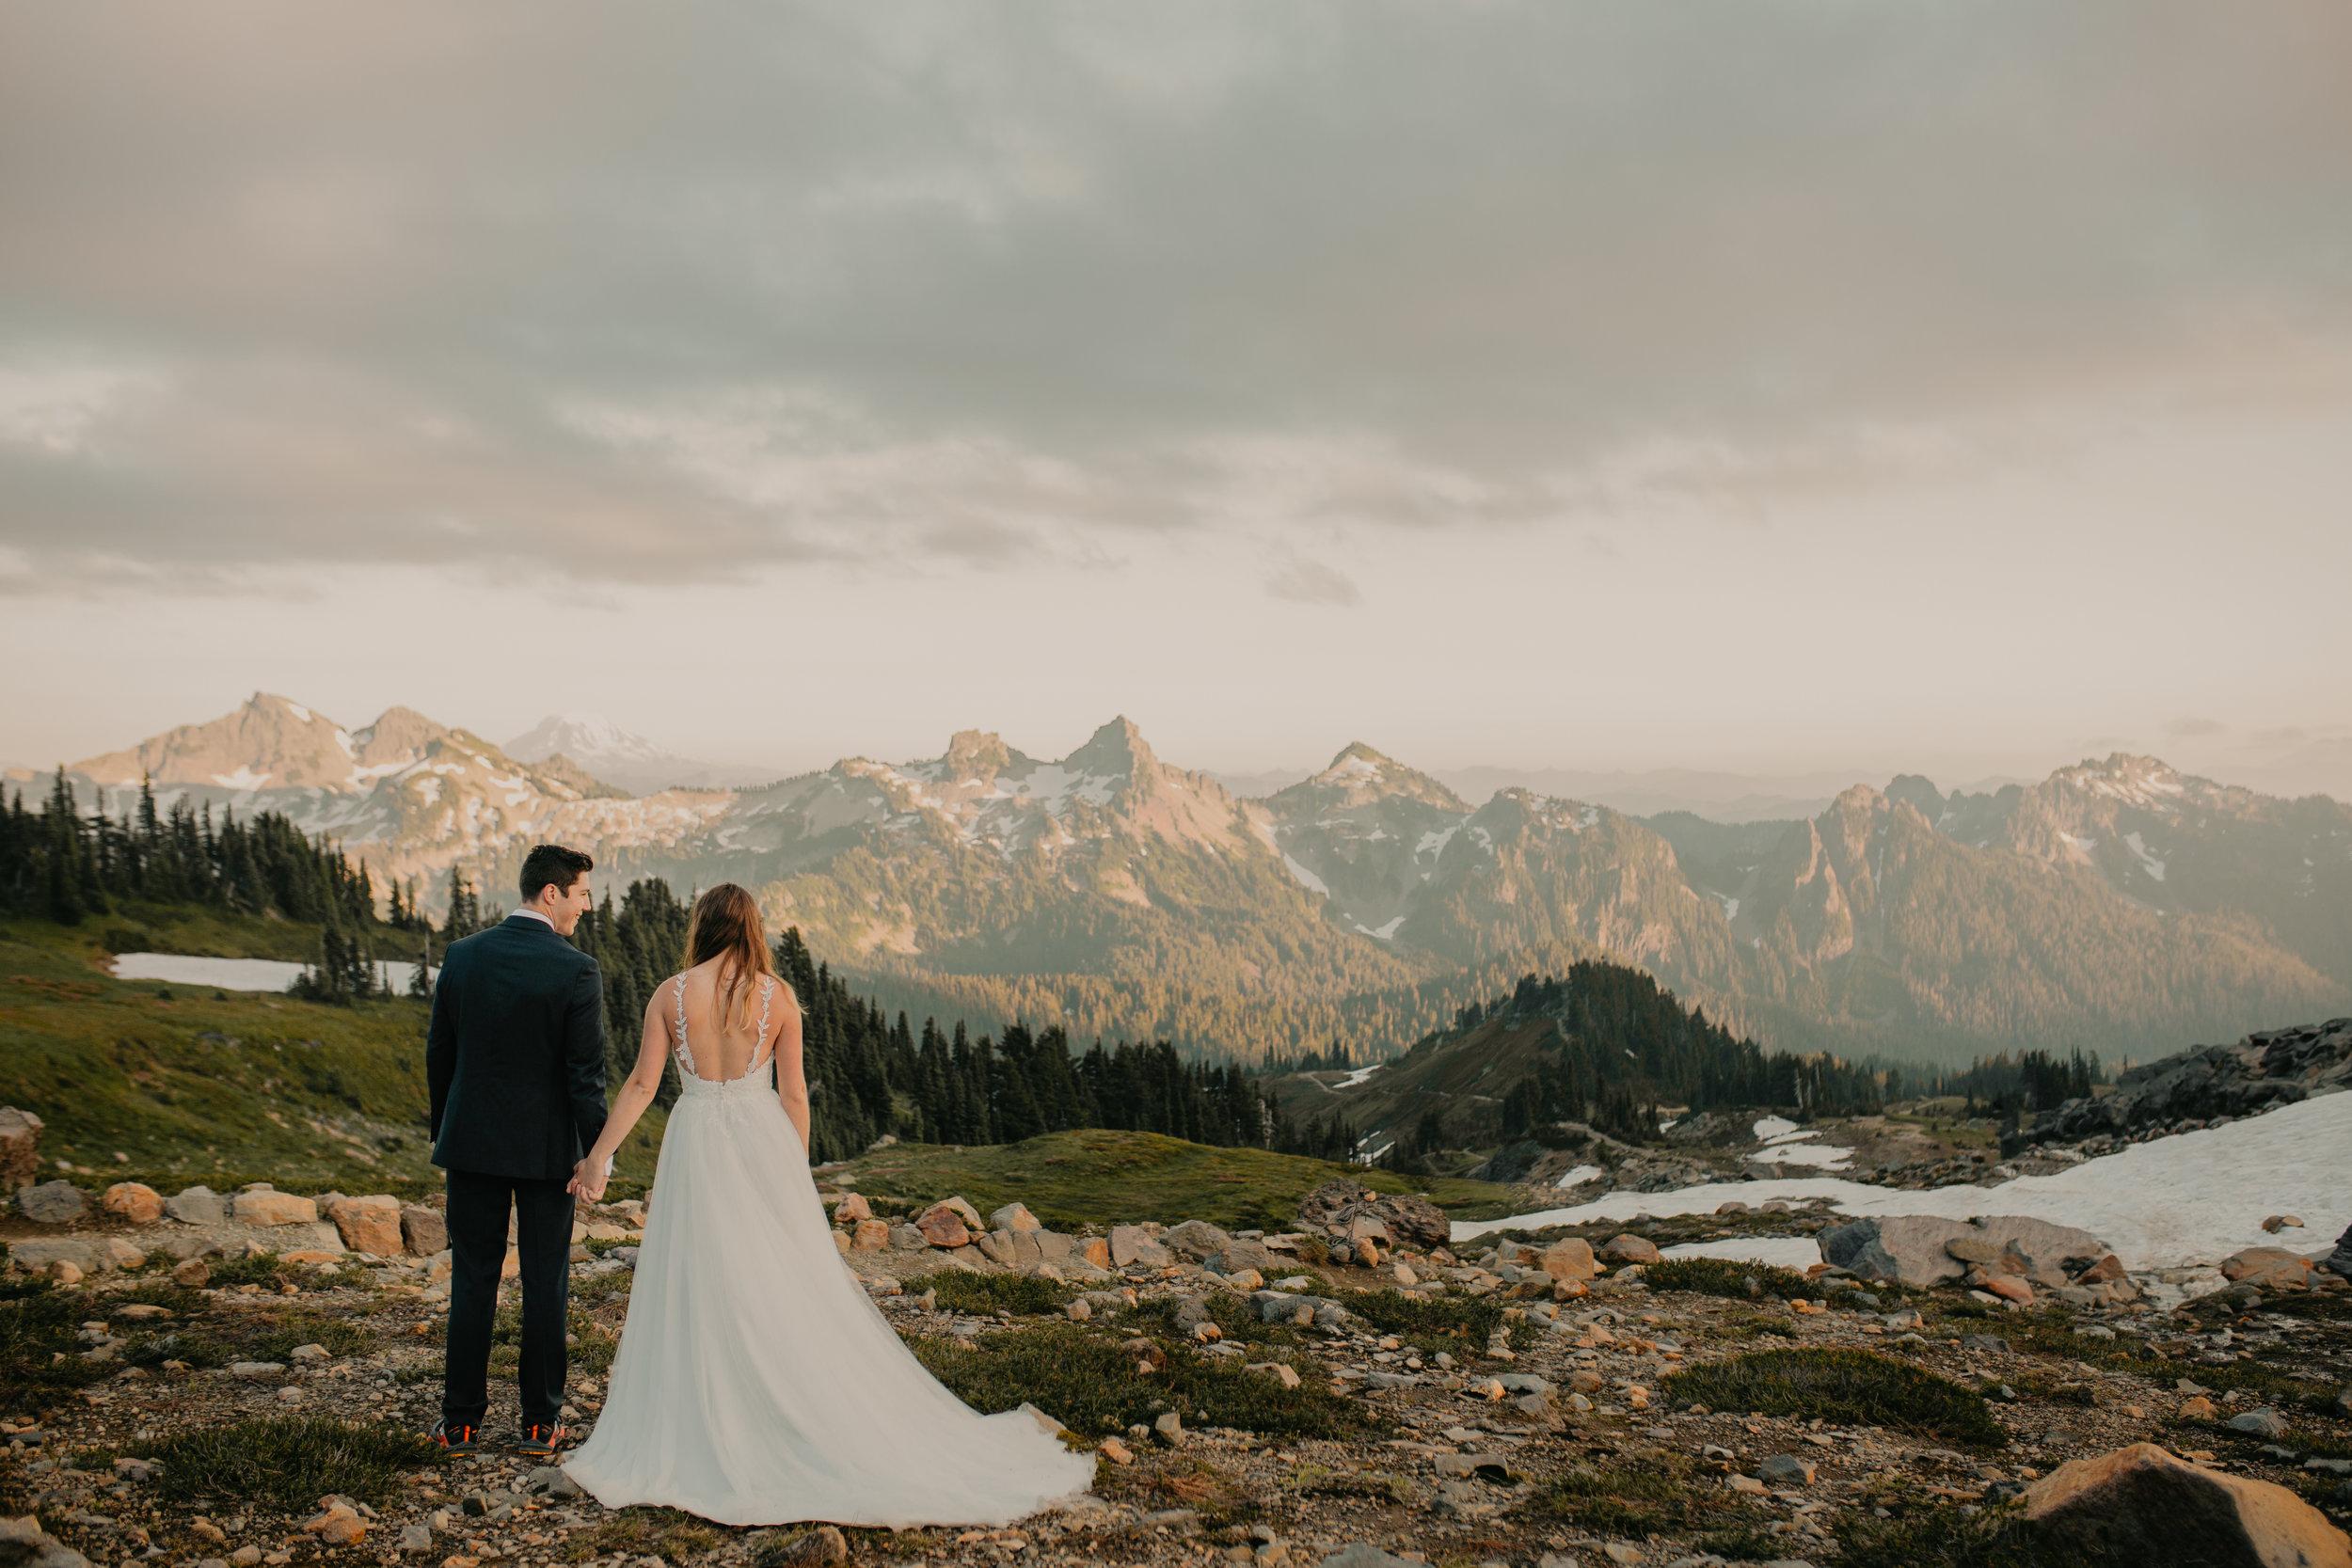 Nicole-Daacke-Photography-Mt-Rainier-elopement-photographer-washington-mountain-epic-wedding-photography-wildflowers-at-rainier-pine-tree-cloudy-summer-day-at-mountain-rainier-45.jpg